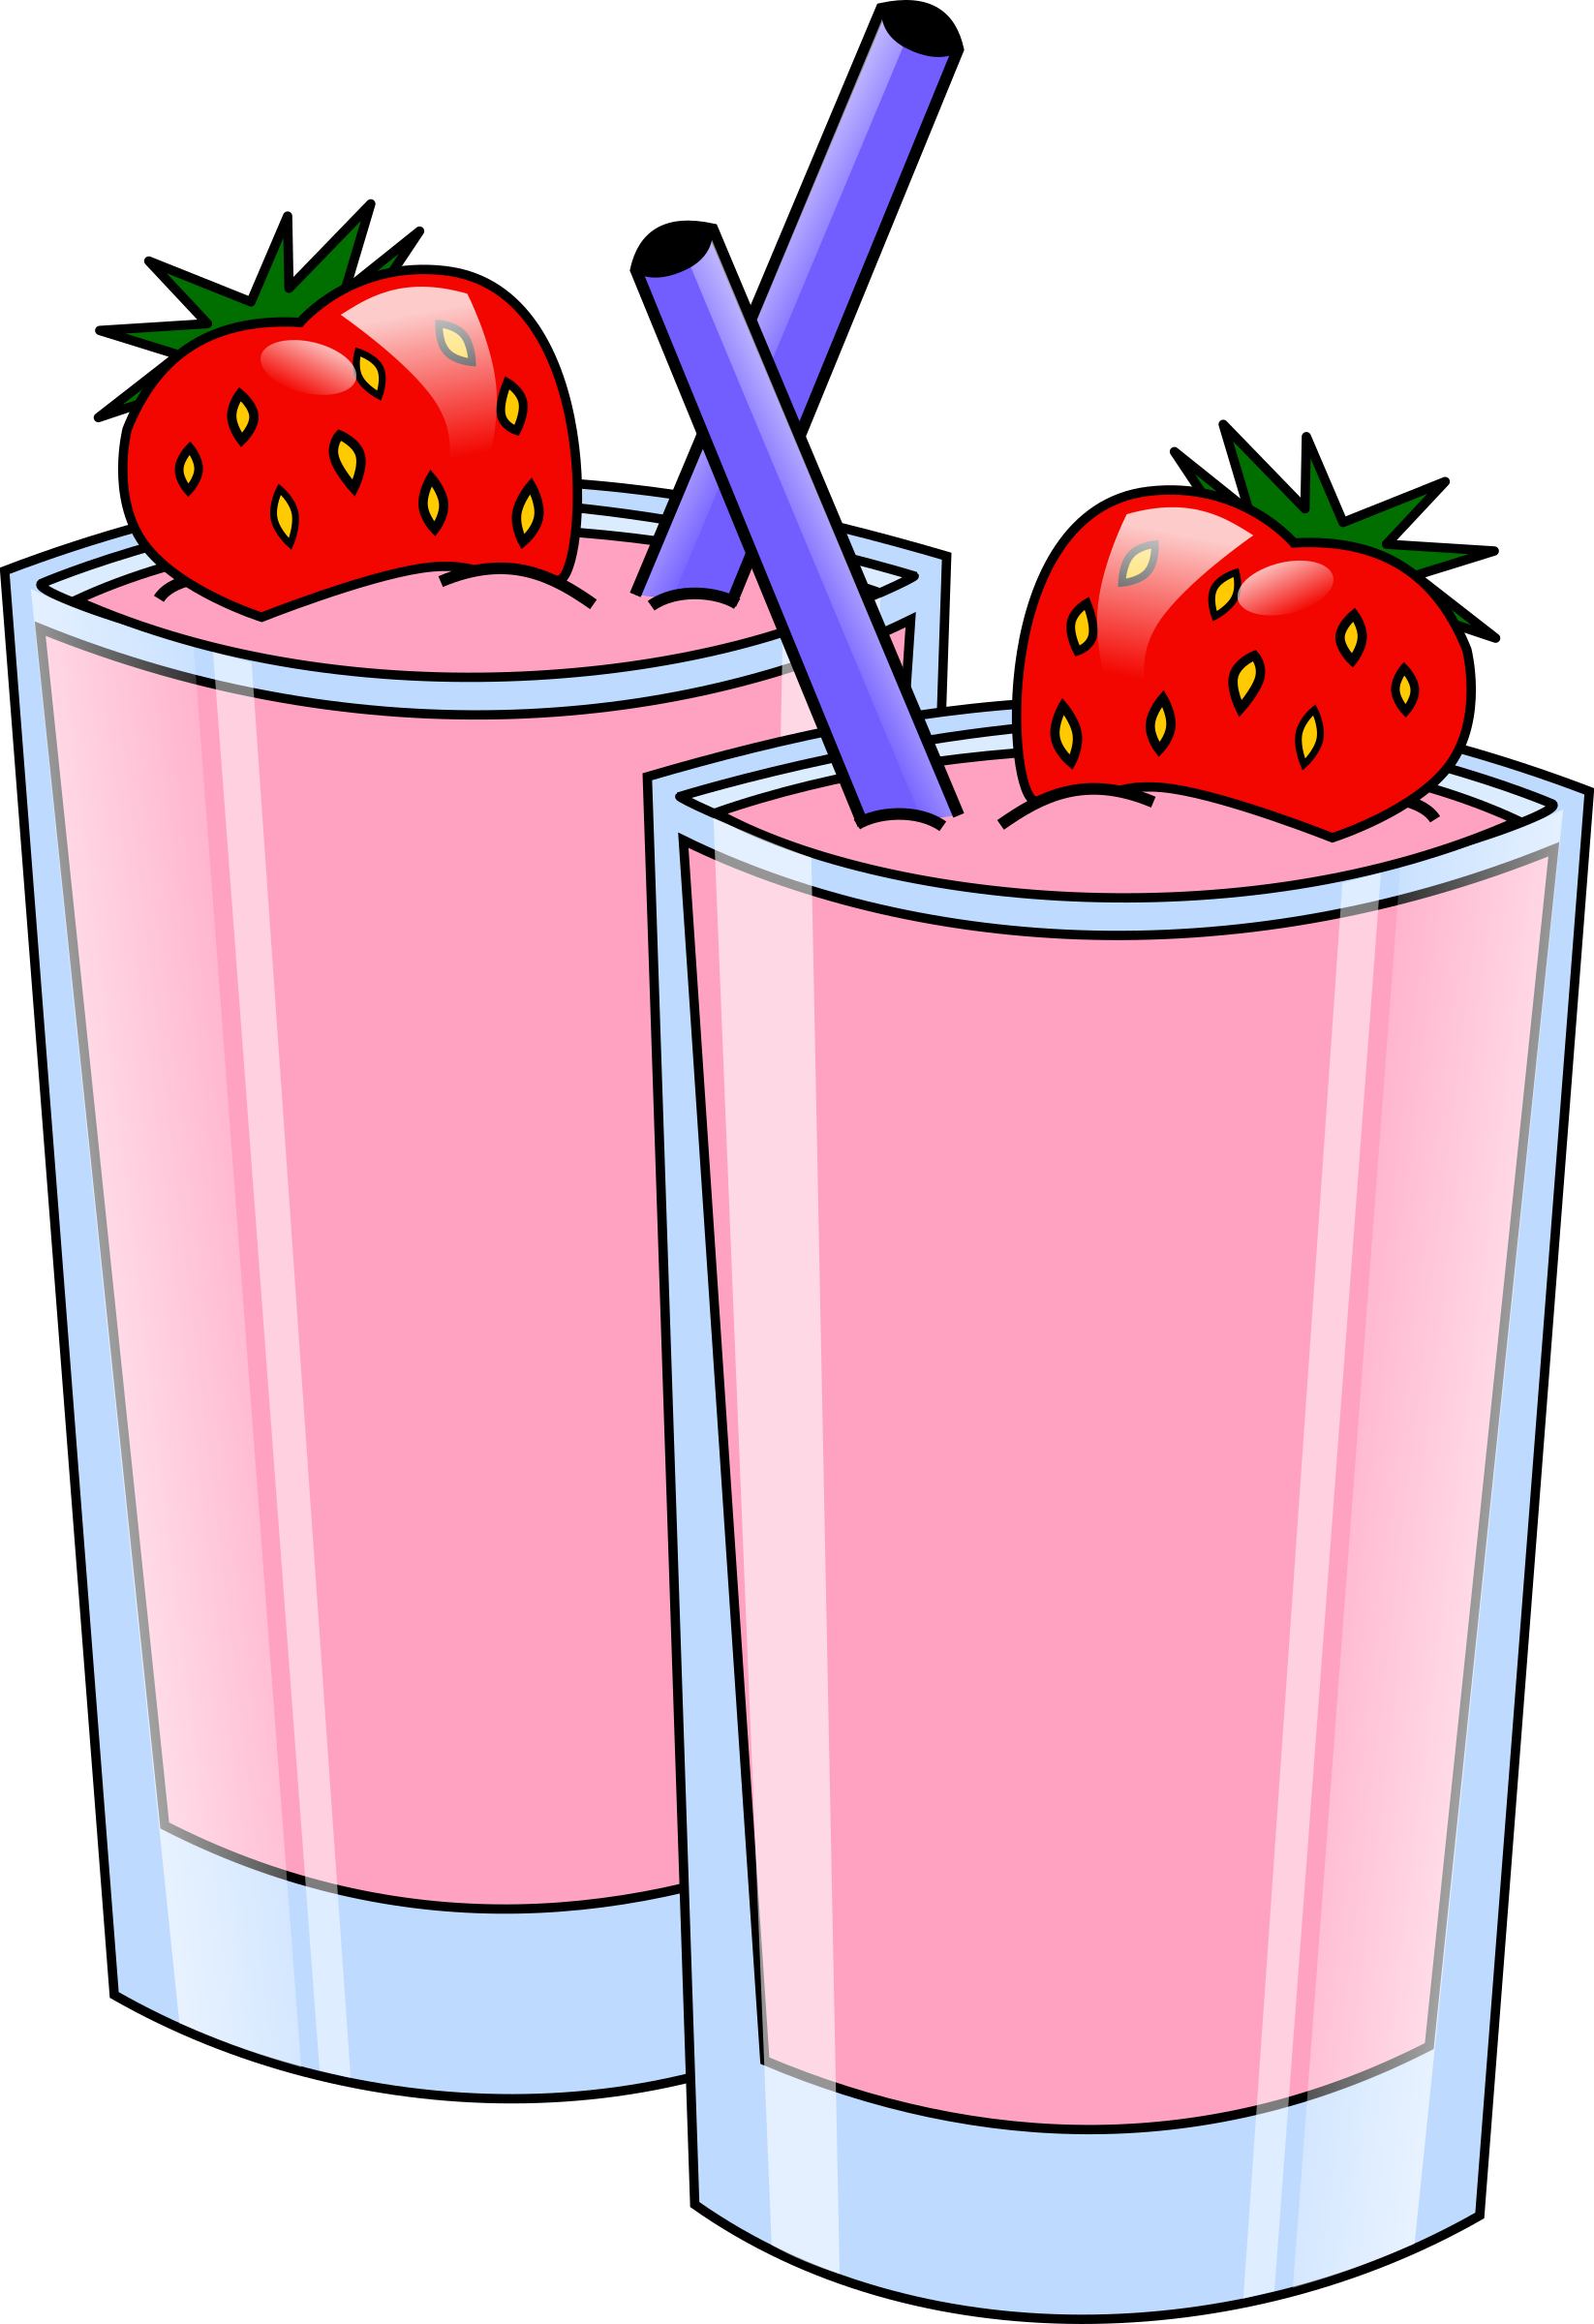 Milkshake at getdrawings com. Florida clipart cartoon